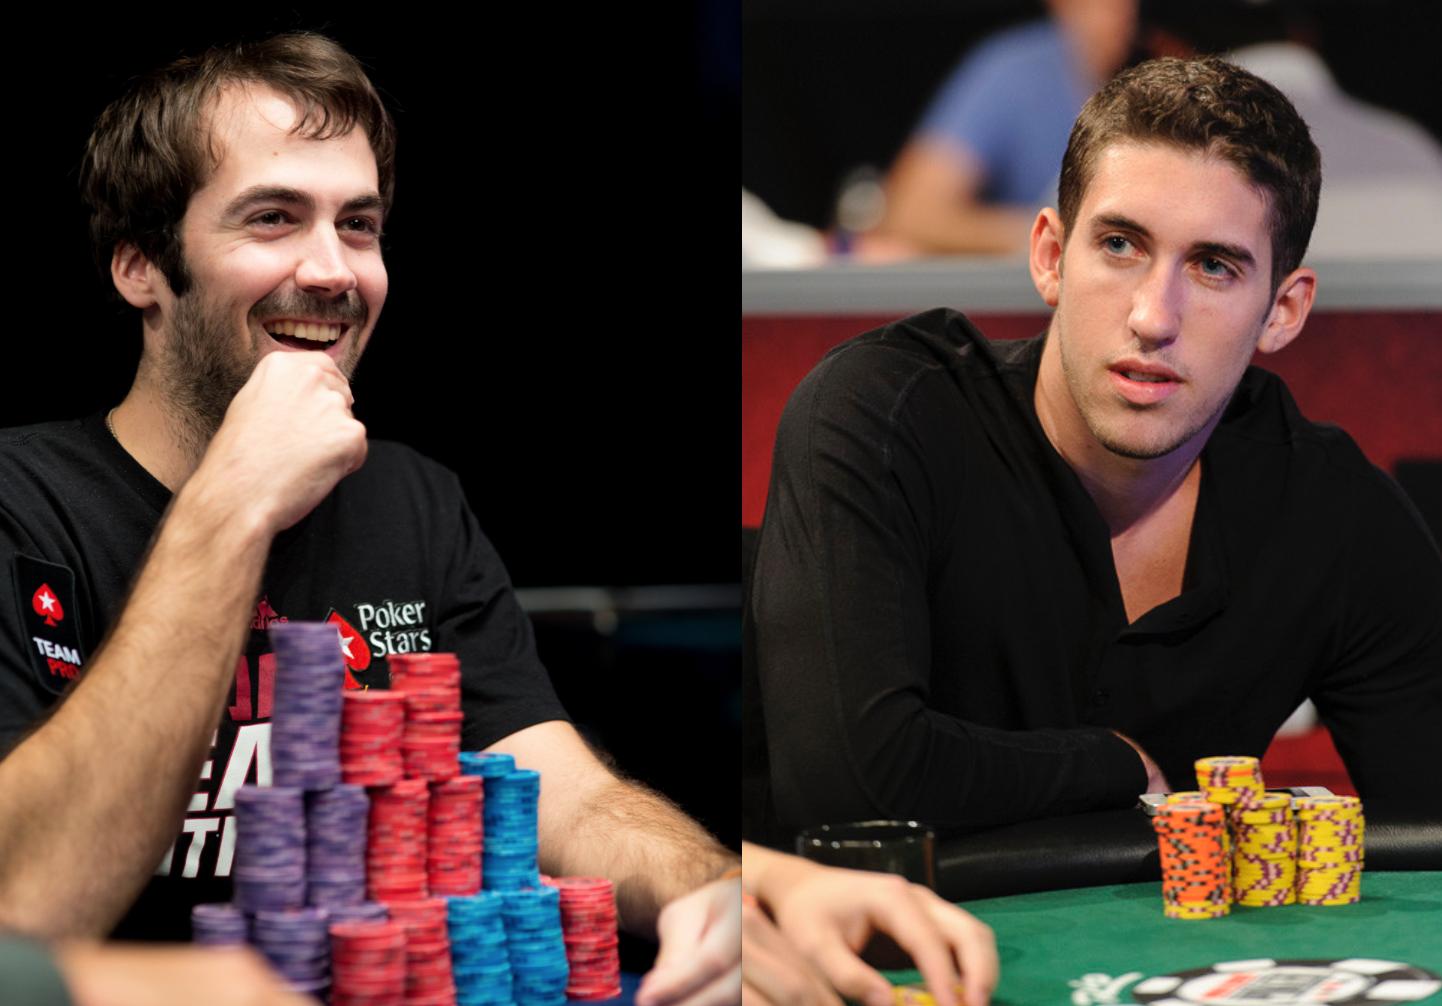 Casino stockport poker best card games gambling